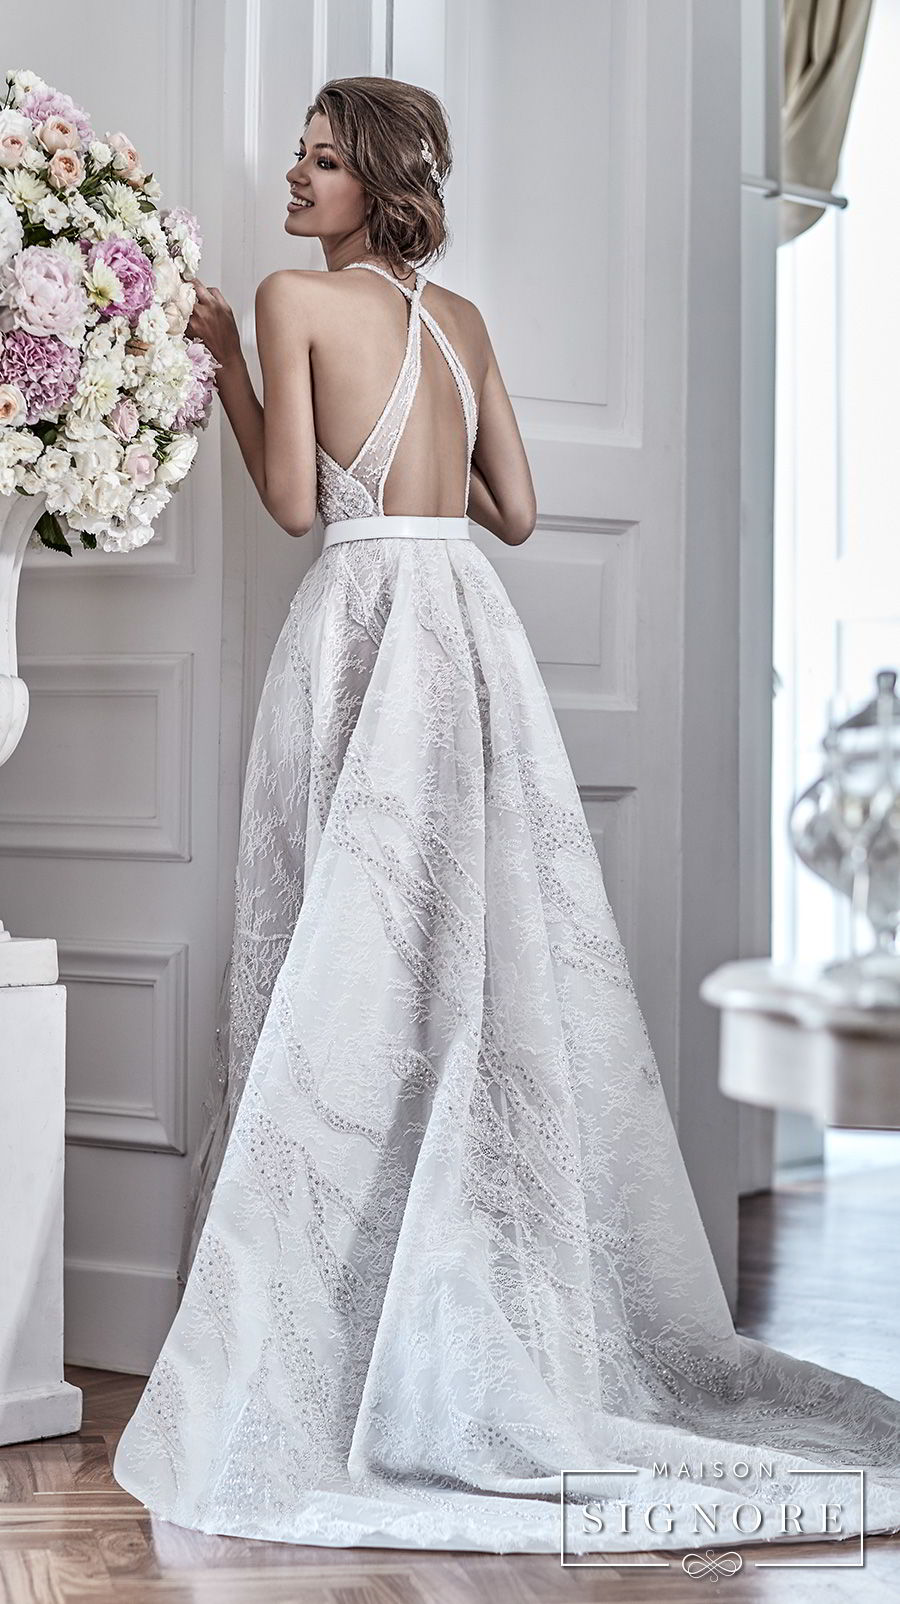 maison signore 2018 bridal sleeveless halter jewel neck full embellishment elegant a line wedding dress with pocket cross strap back chapel train (demy) bv